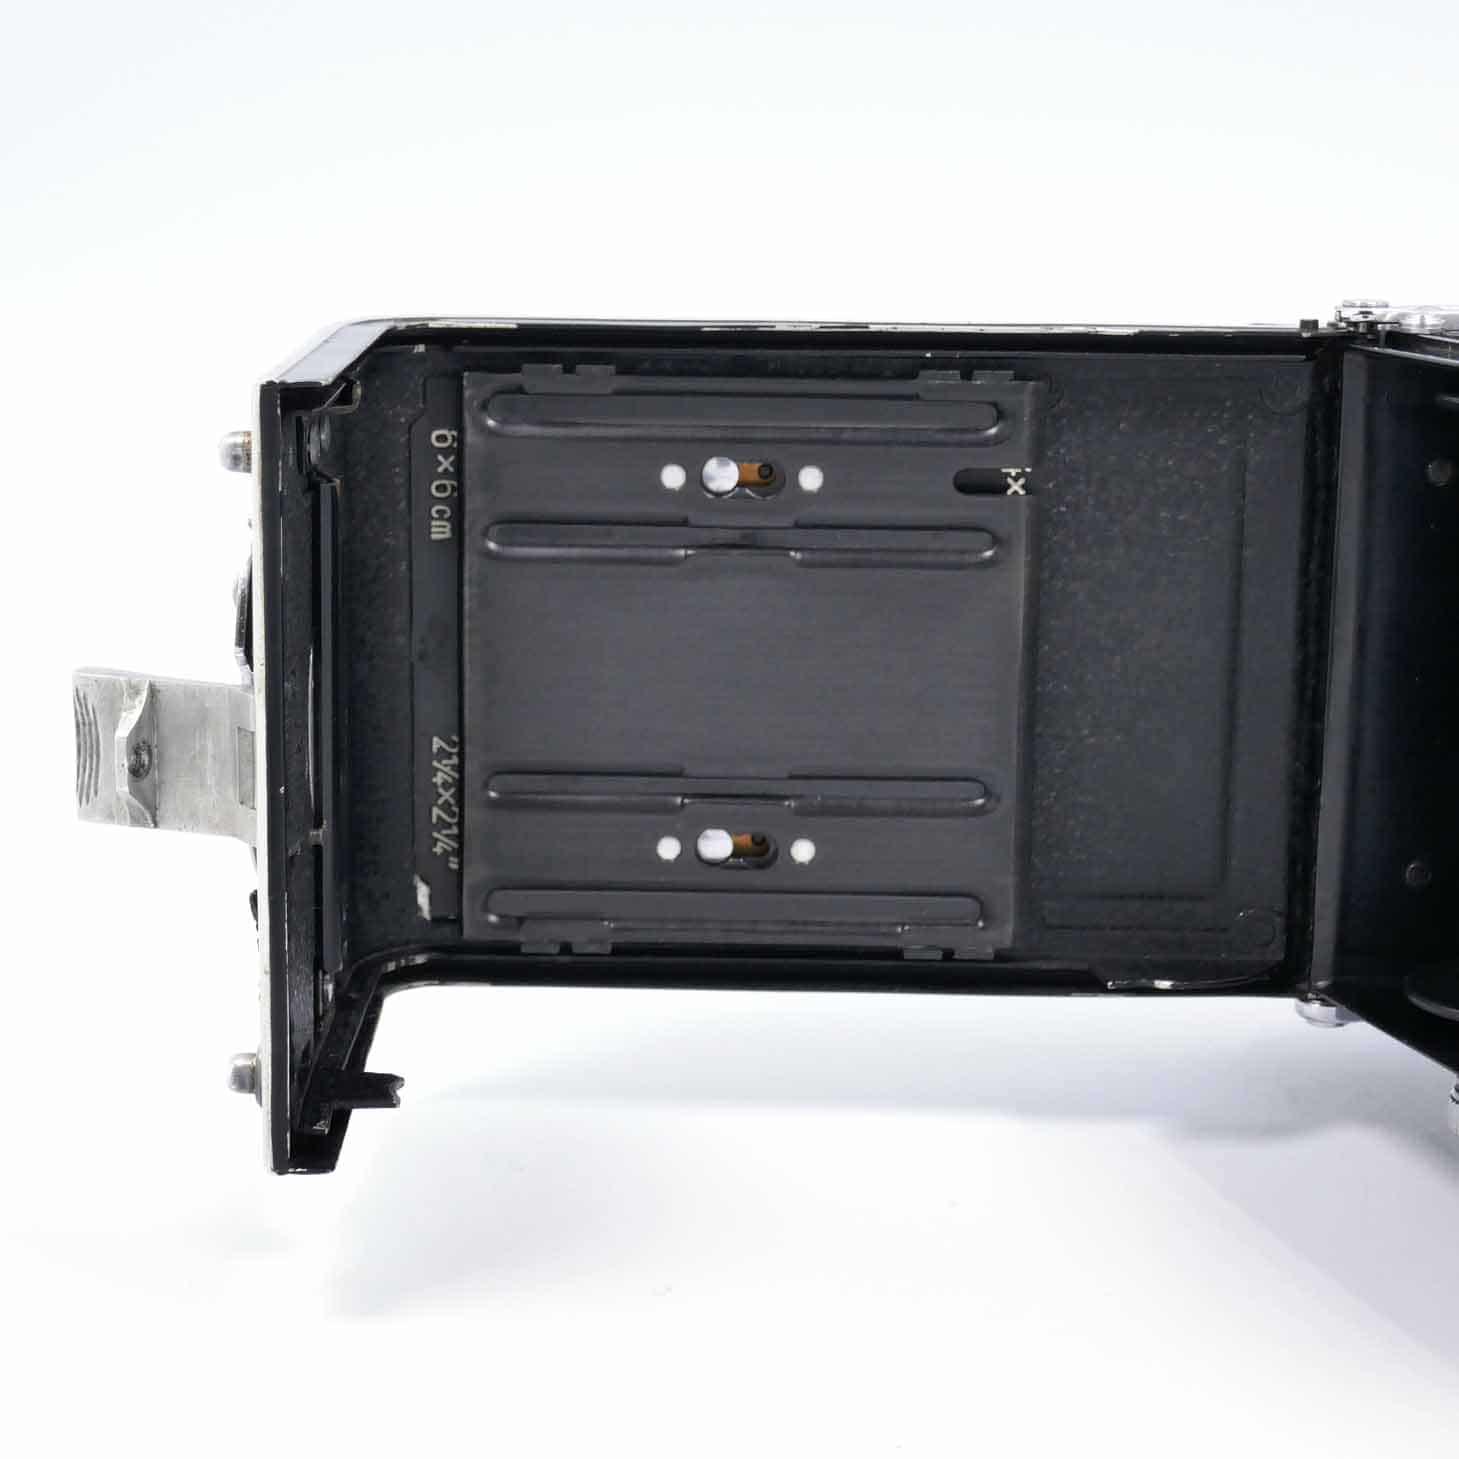 clean-cameras-Rolleiflex-2.8-F05